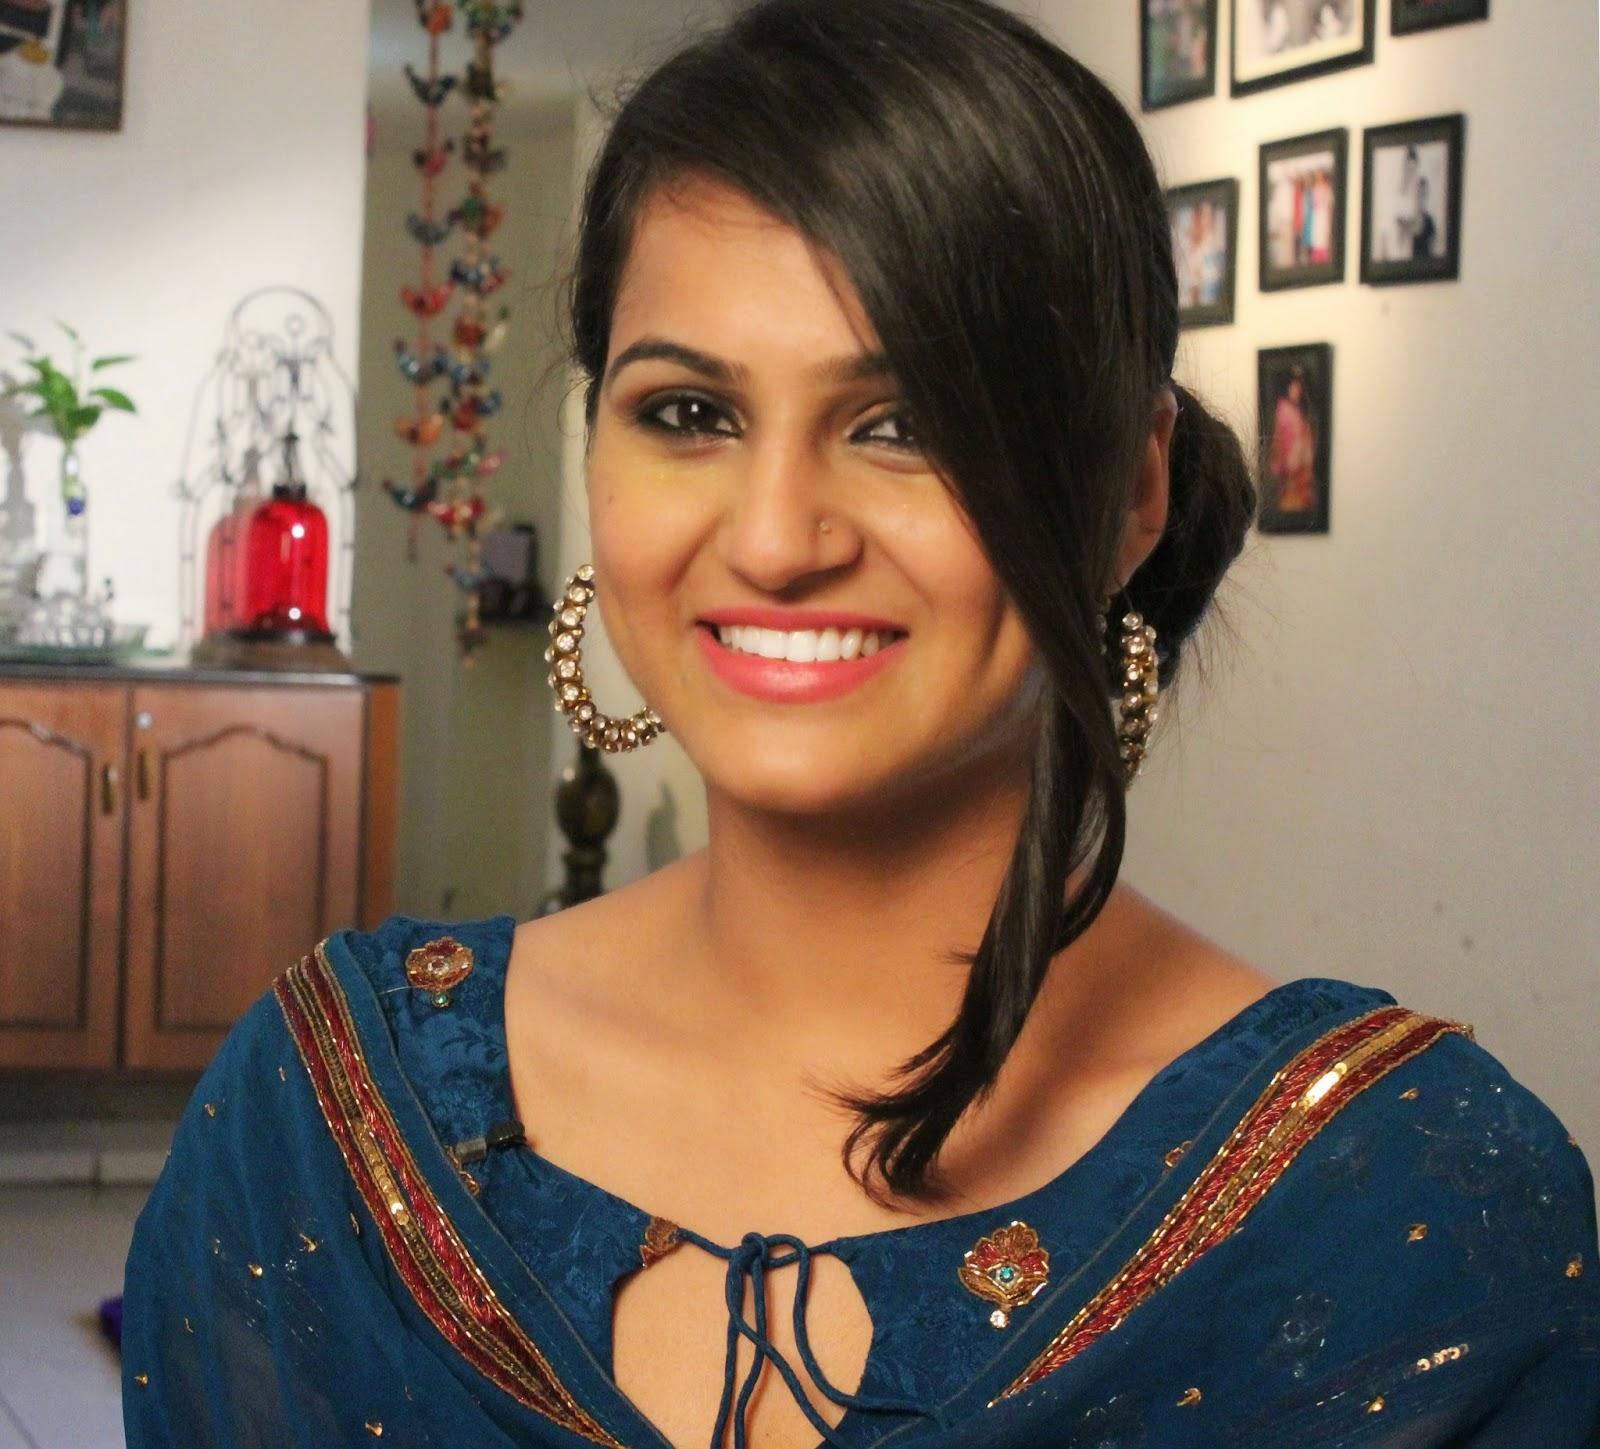 Hairstyles For Long Hair Juda : Indian Wedding Hairstyles for Long Hair